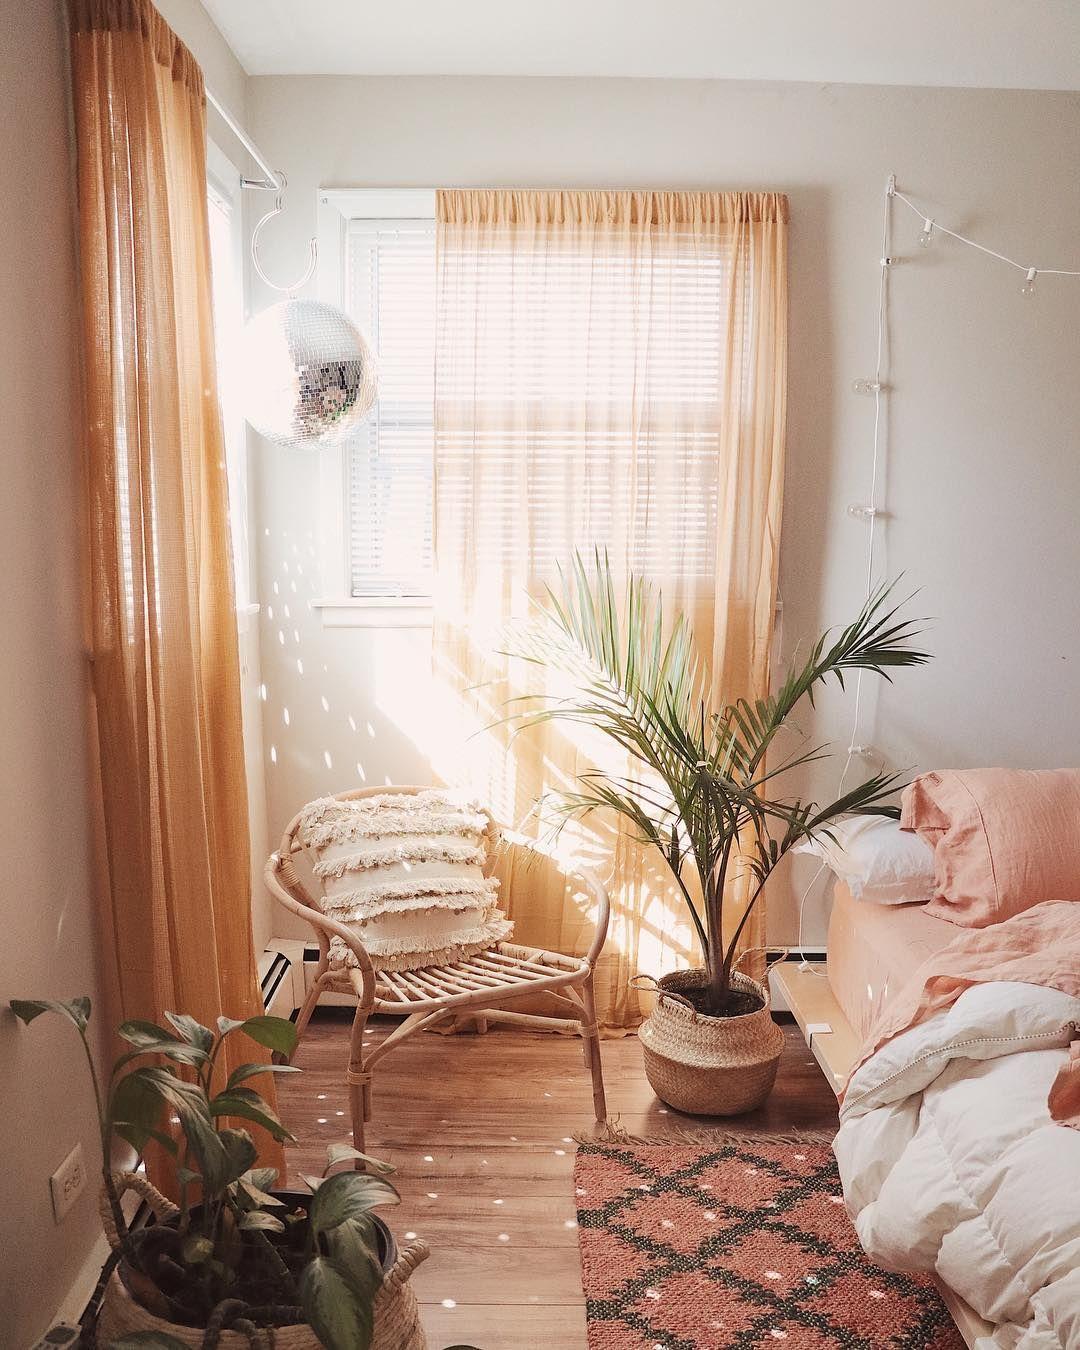 bedroom, wooden floor, white wall, orange curtain, wooden bed platform, rattan chair, plants on the floor